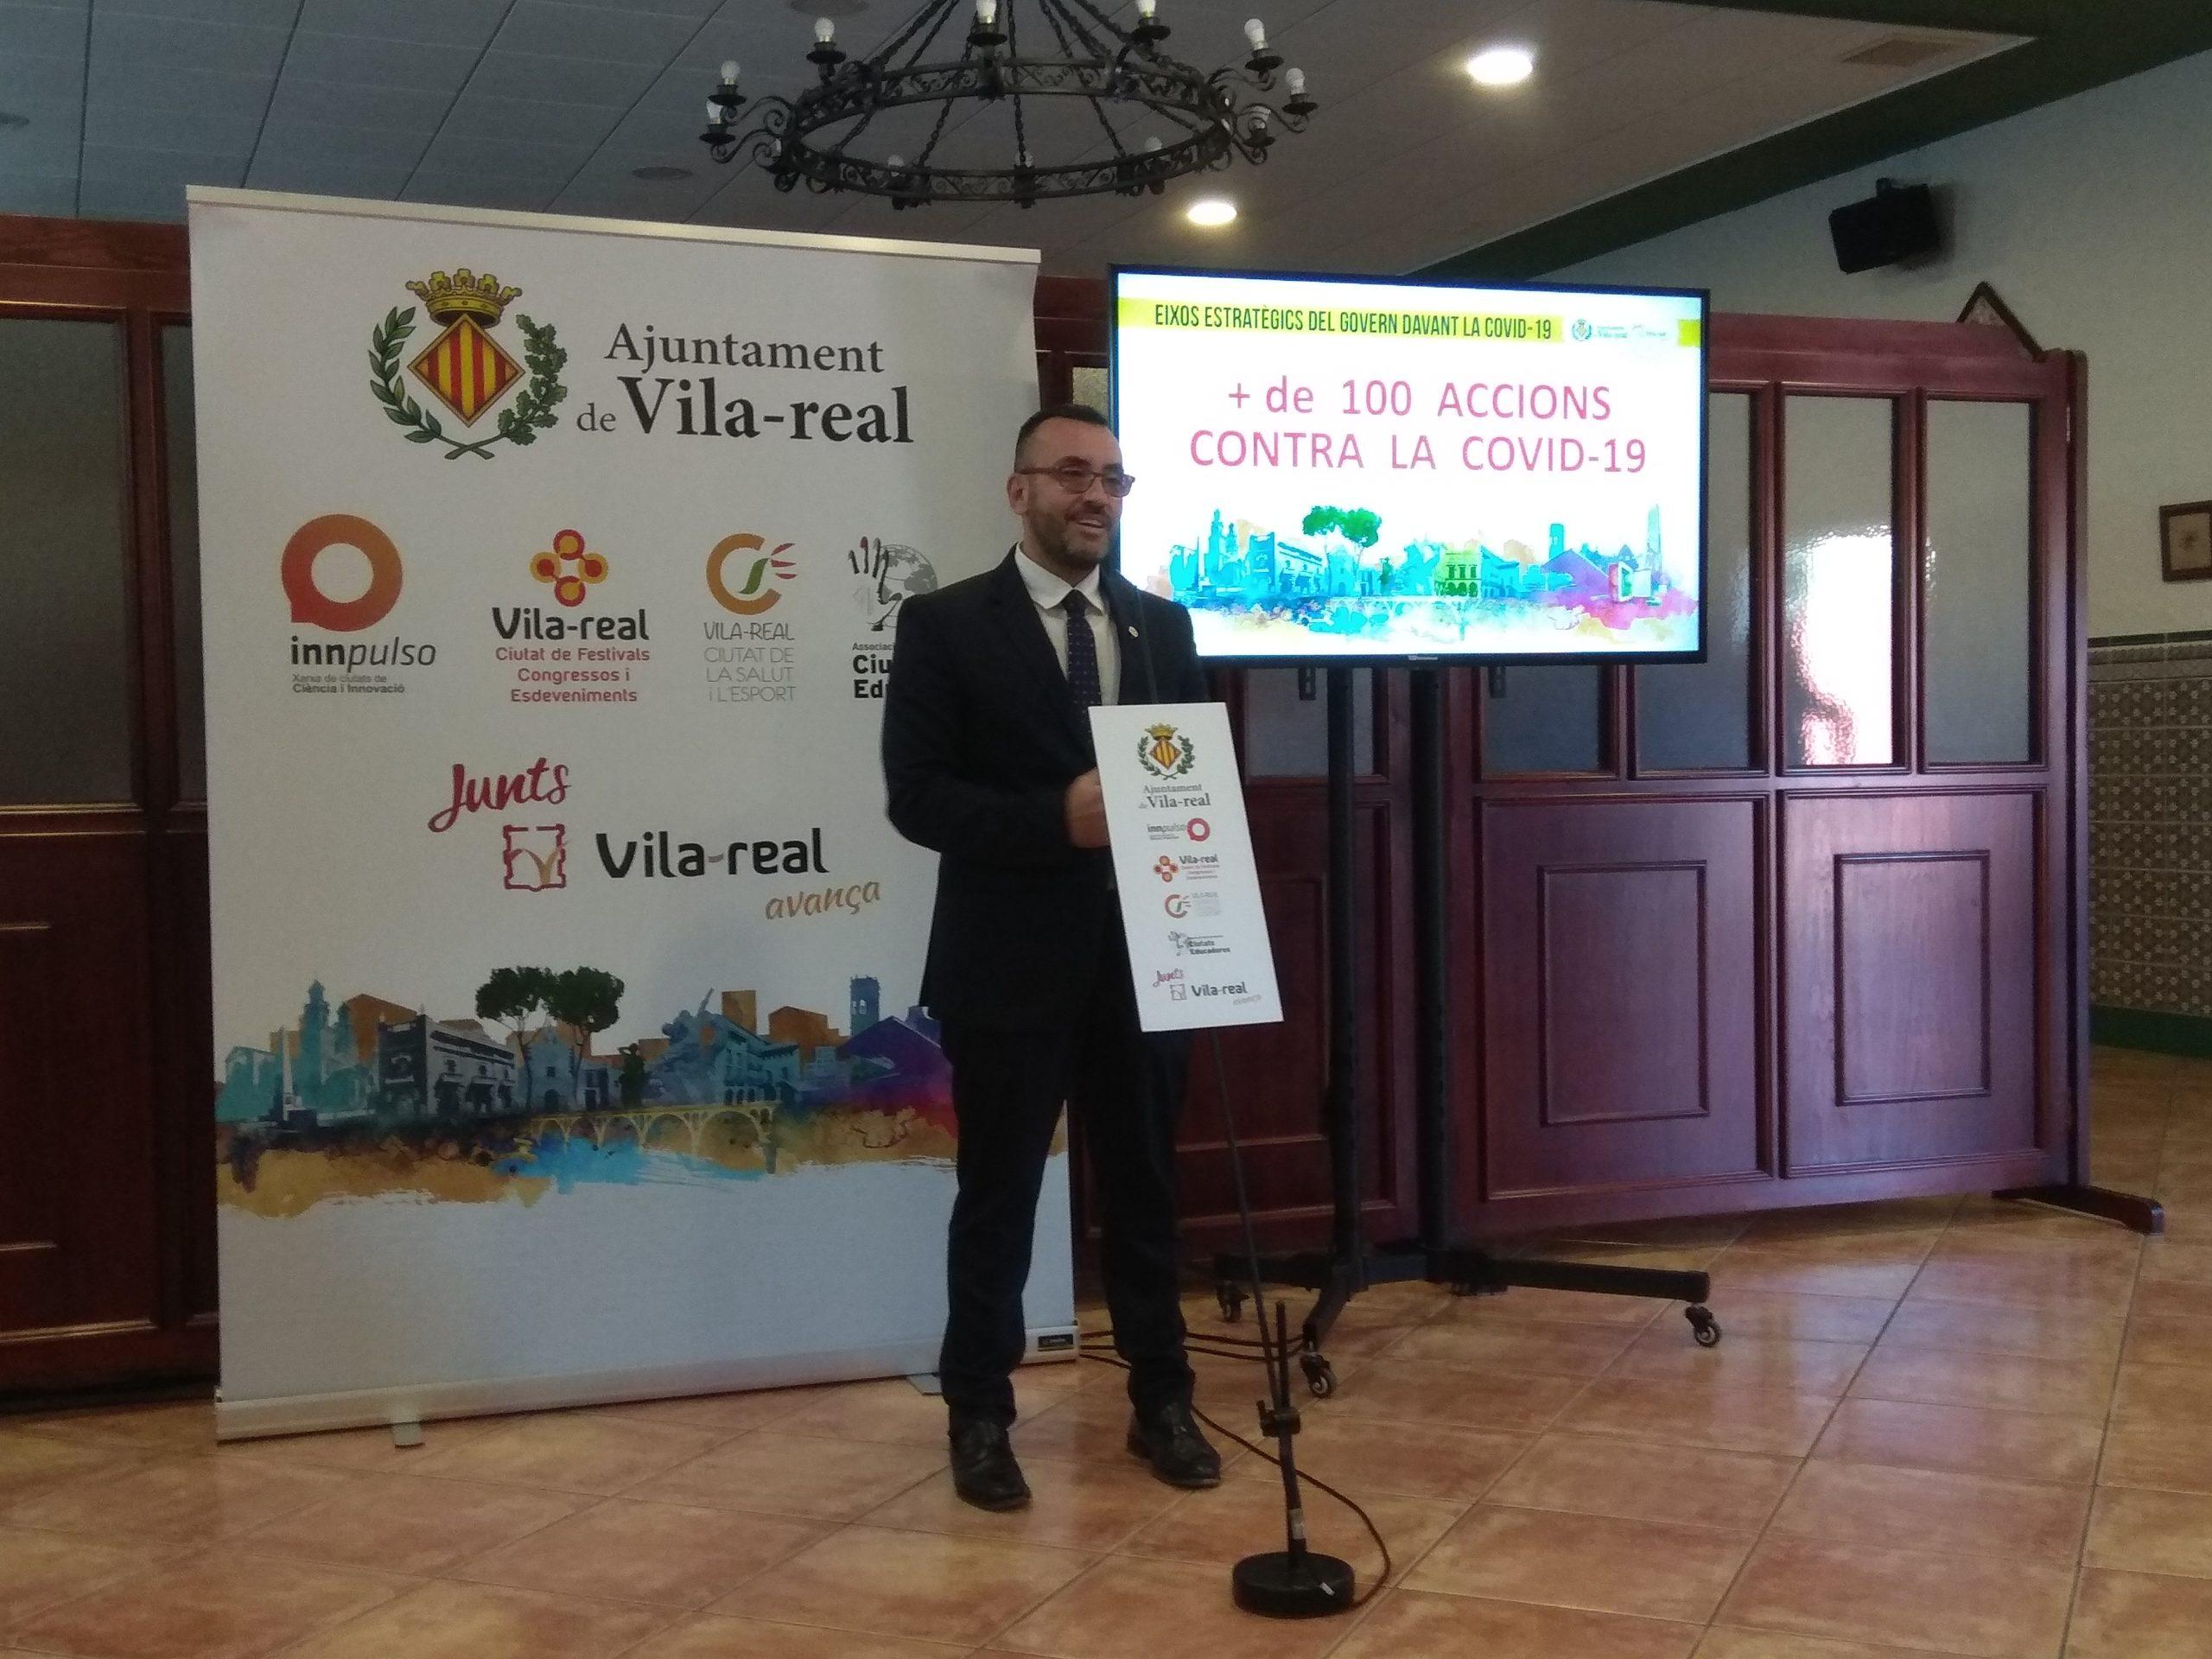 Escucha al completo la rueda de prensa del alcalde de Vila-real, José Benlloch